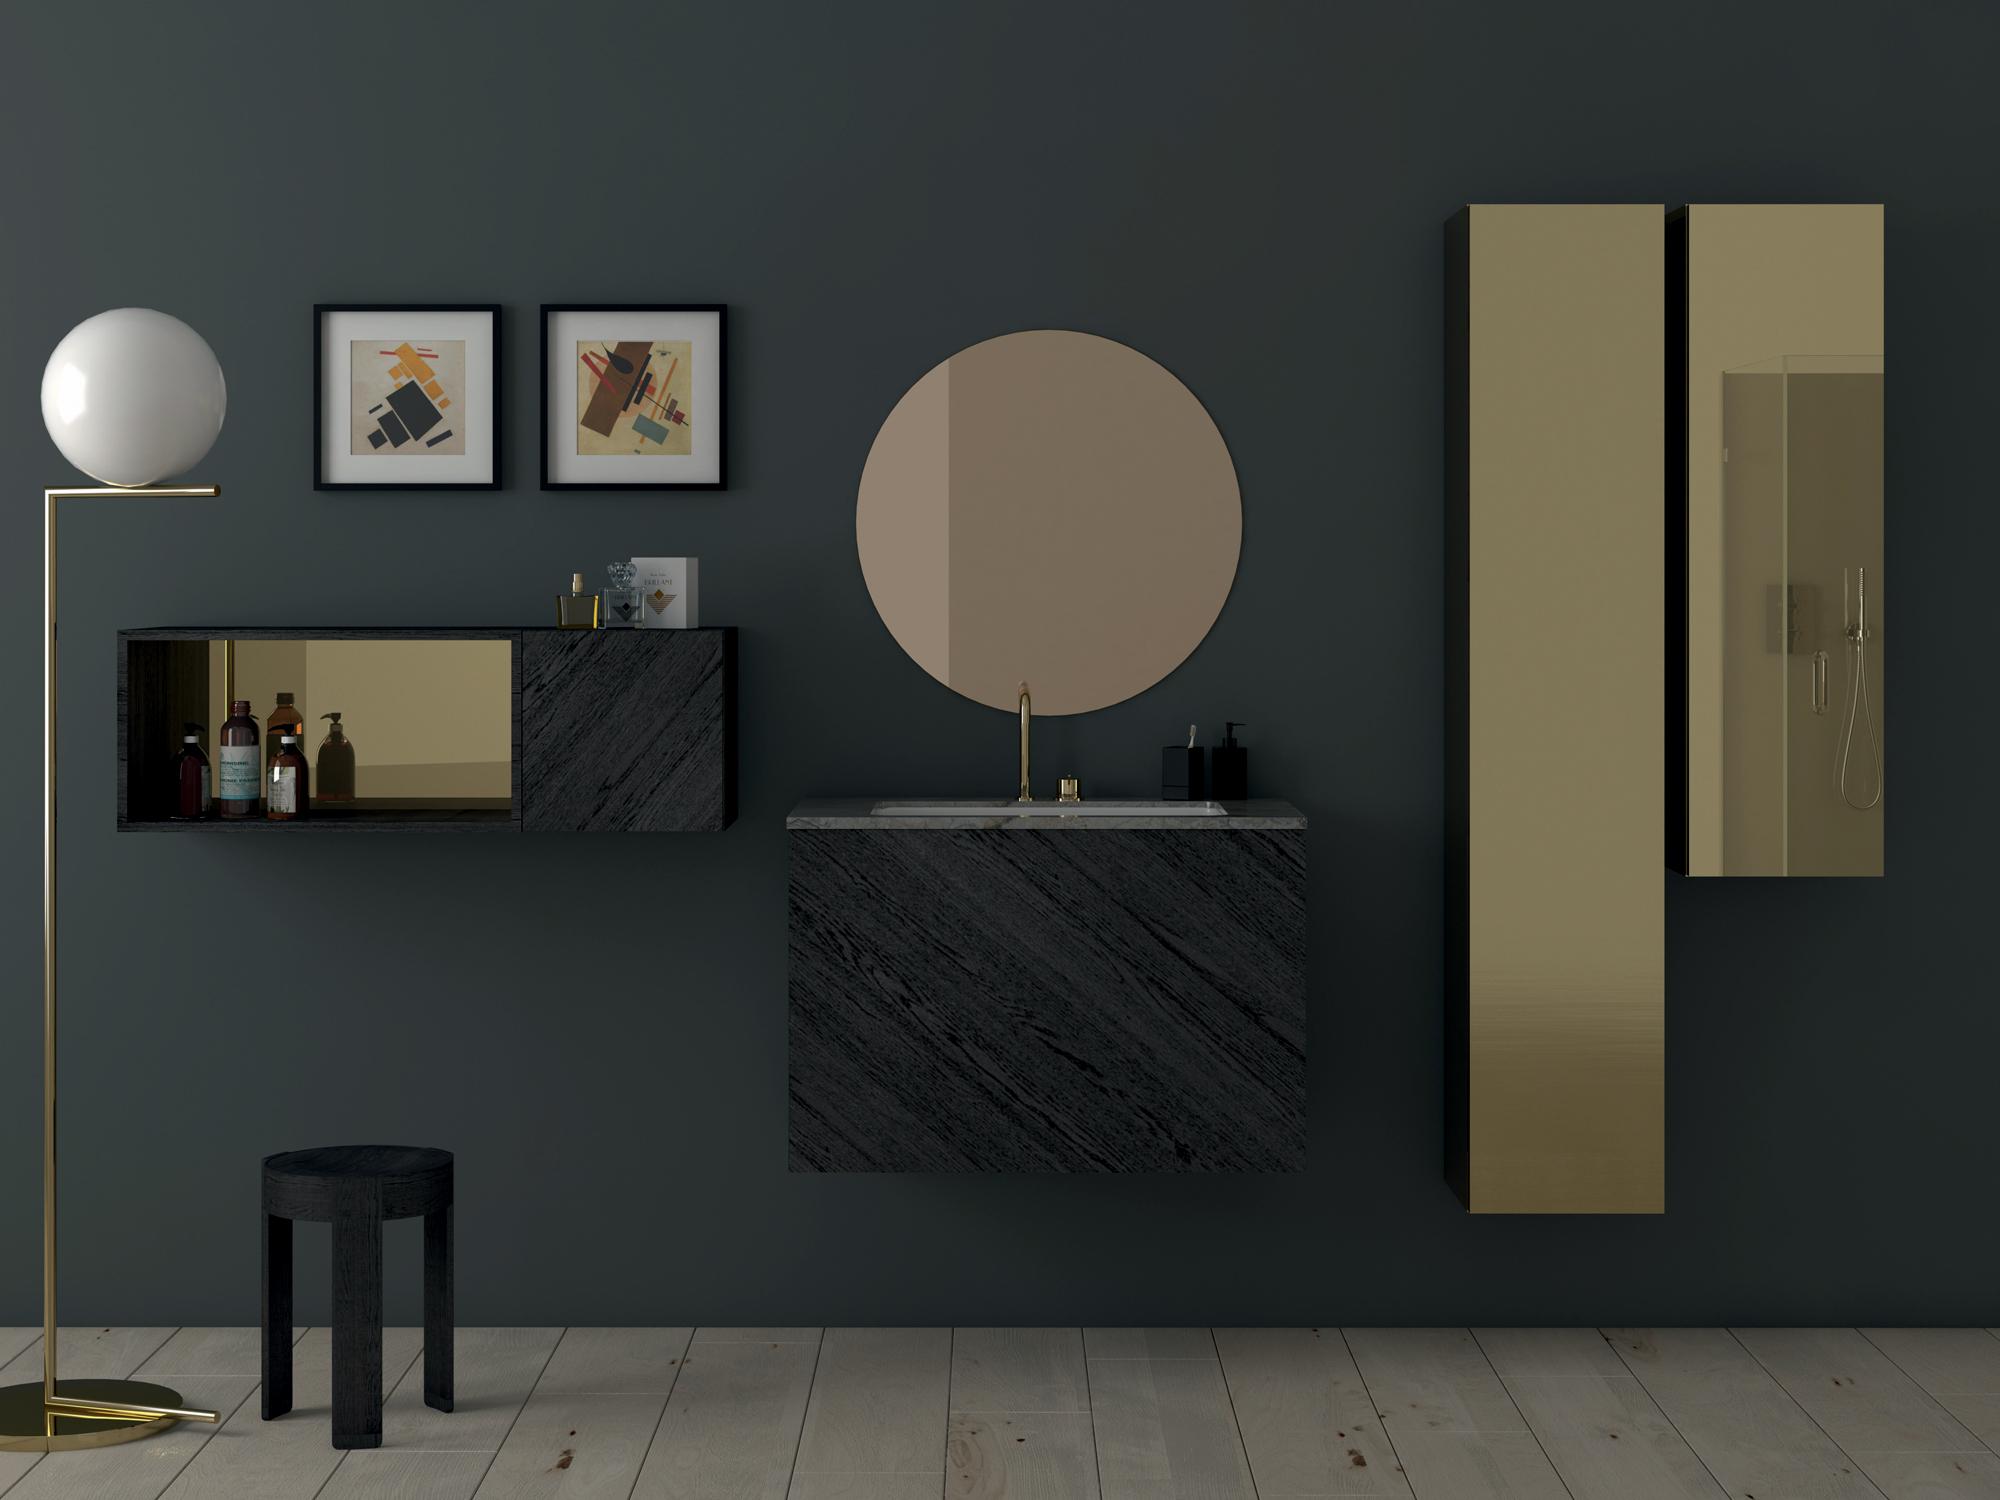 van marcke lance une collection de meubles 100 belges d co id es. Black Bedroom Furniture Sets. Home Design Ideas